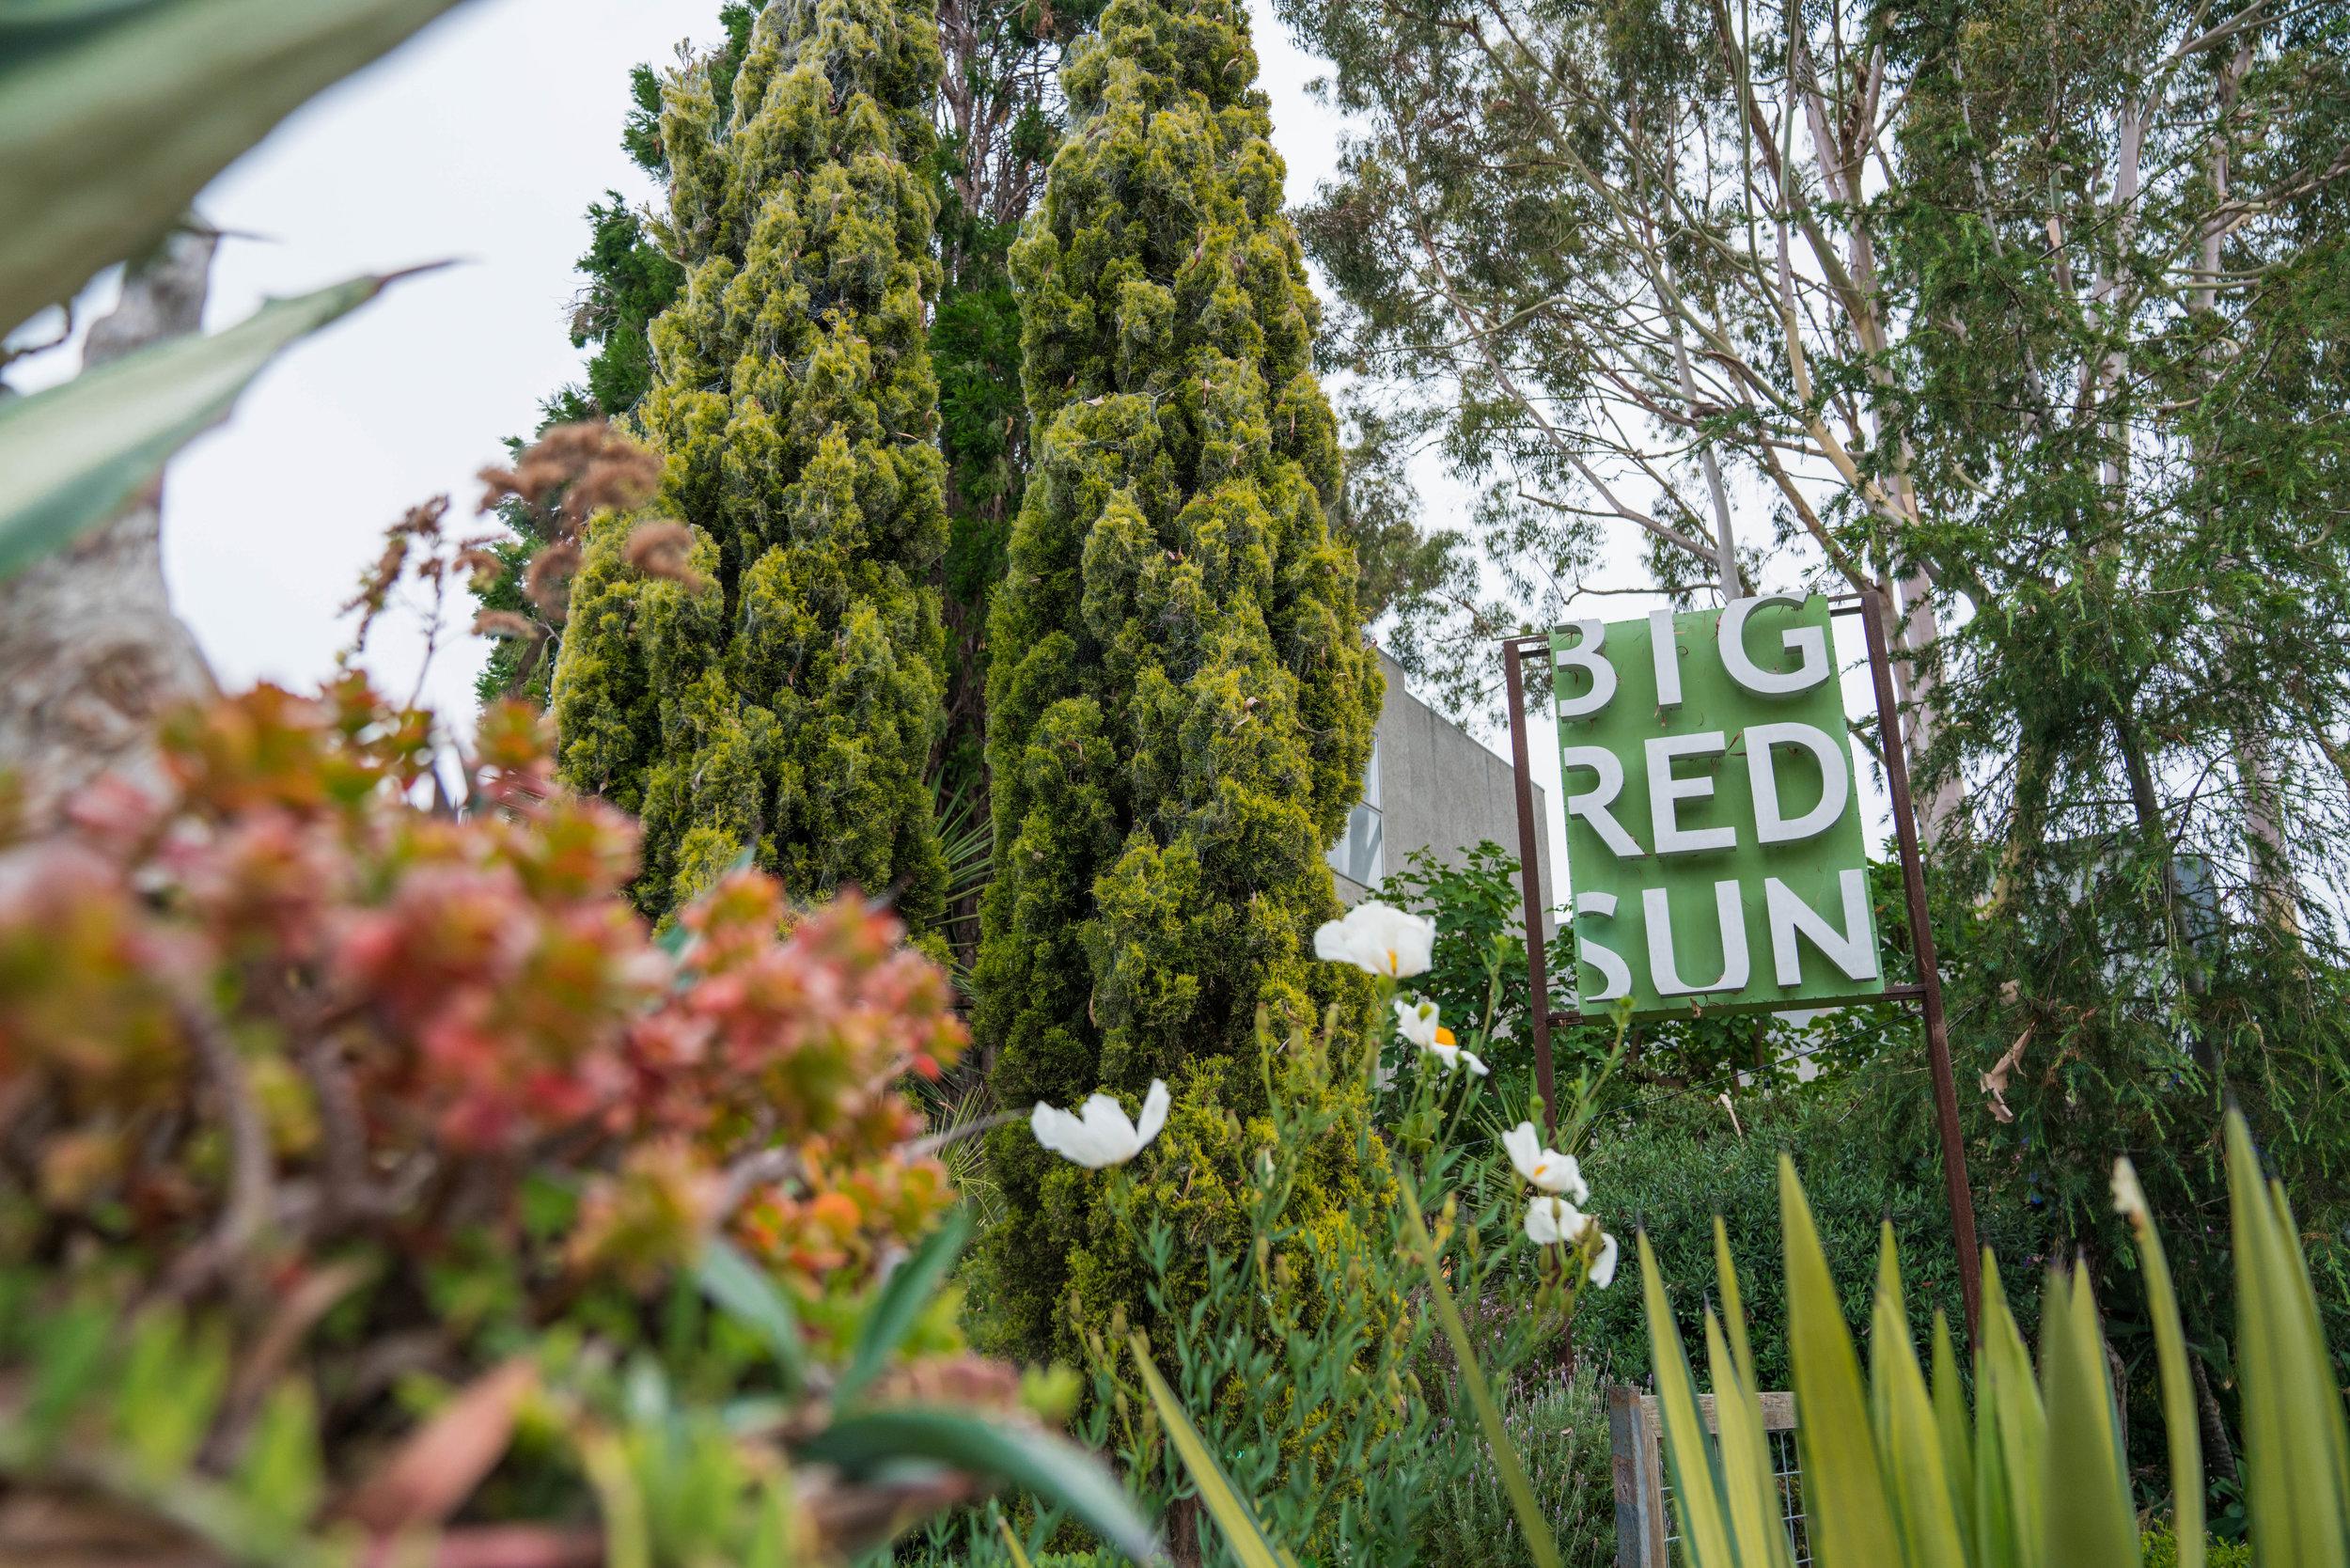 Big-Red-Sun-LA-Rose-Ave-Shop-Shelley-Neuman-02194.jpg